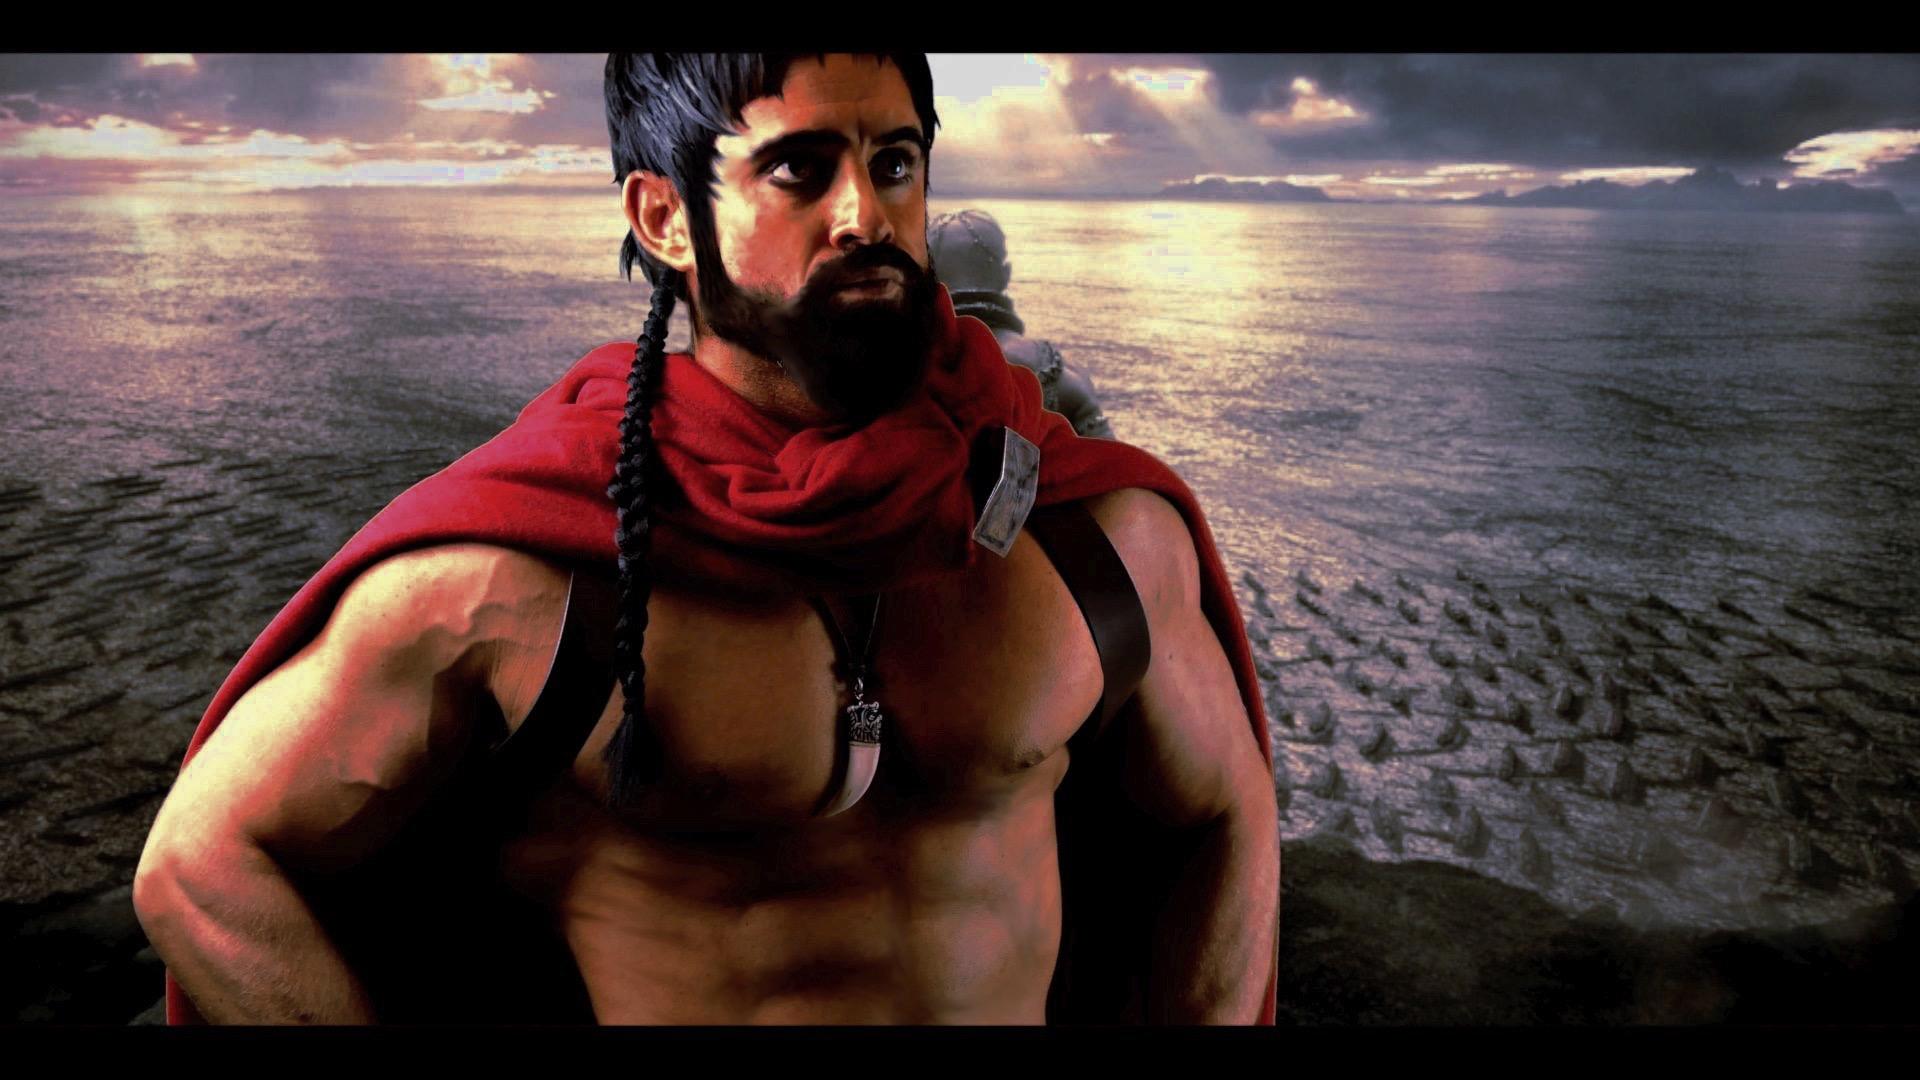 King Leonidas